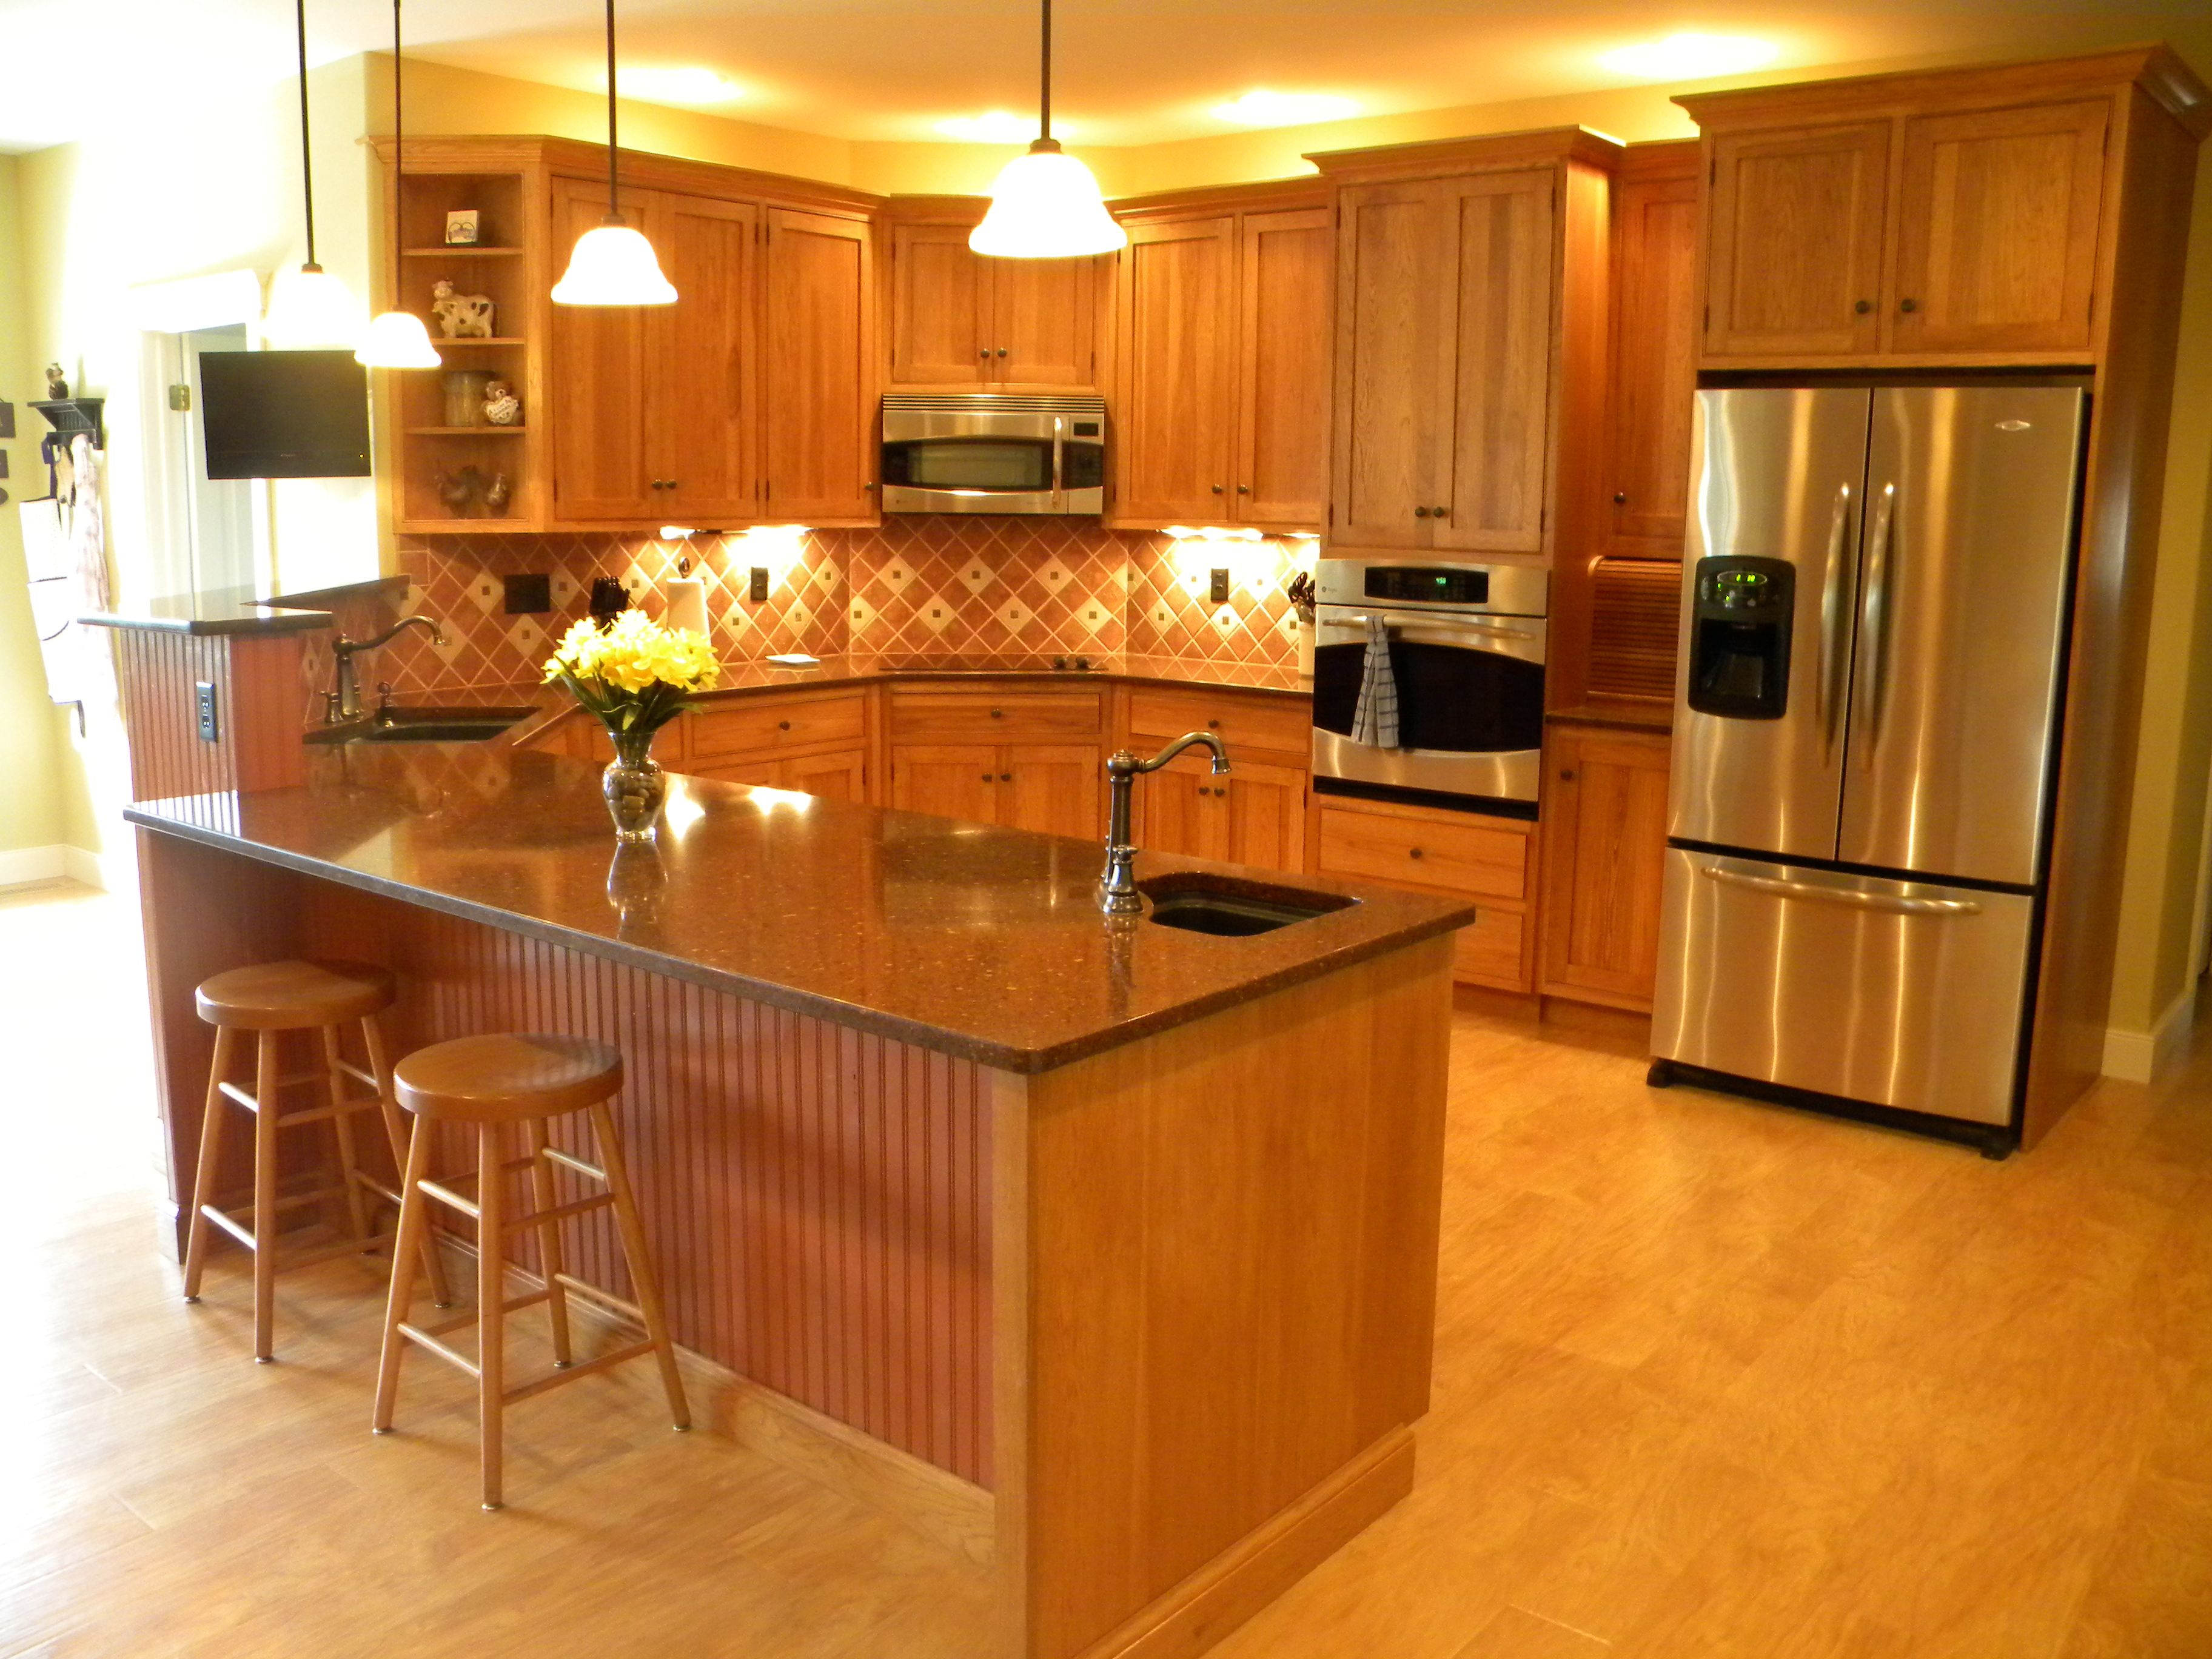 custom open u shaped kitchen with a country primitive design by summit10 u shaped kitchen on u kitchen decor id=38020